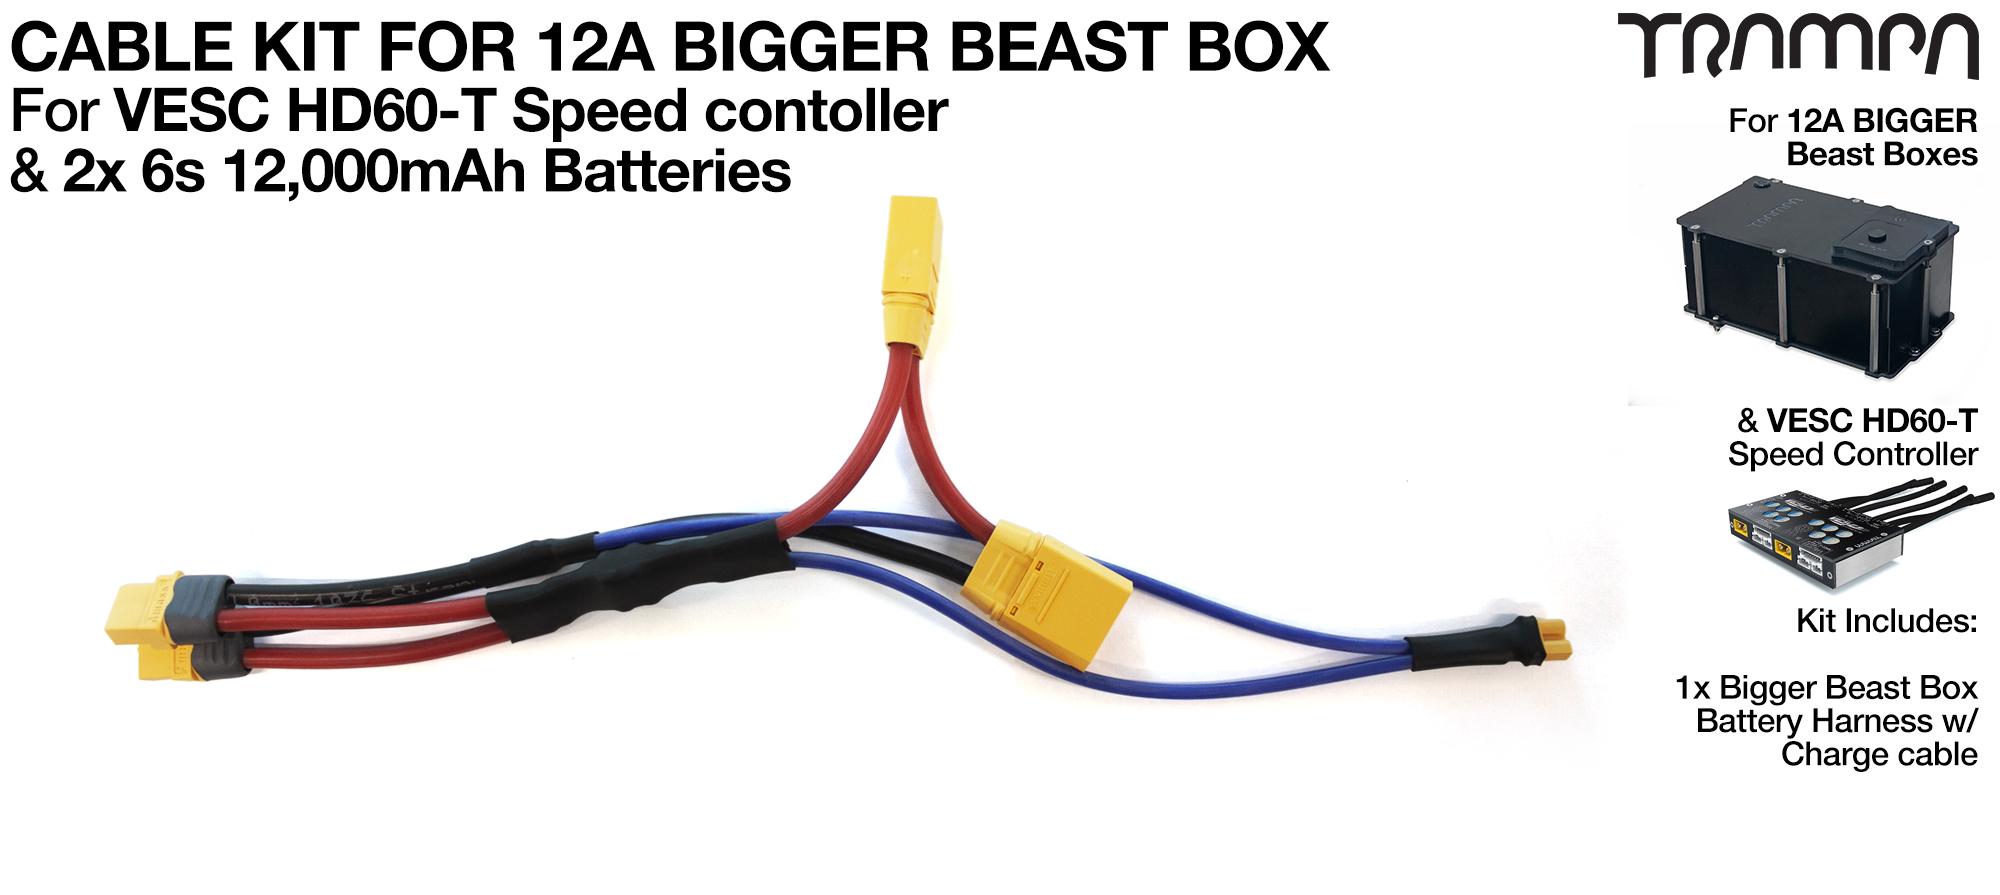 2019 BEAST BOX TWIN VESC Cable Kit